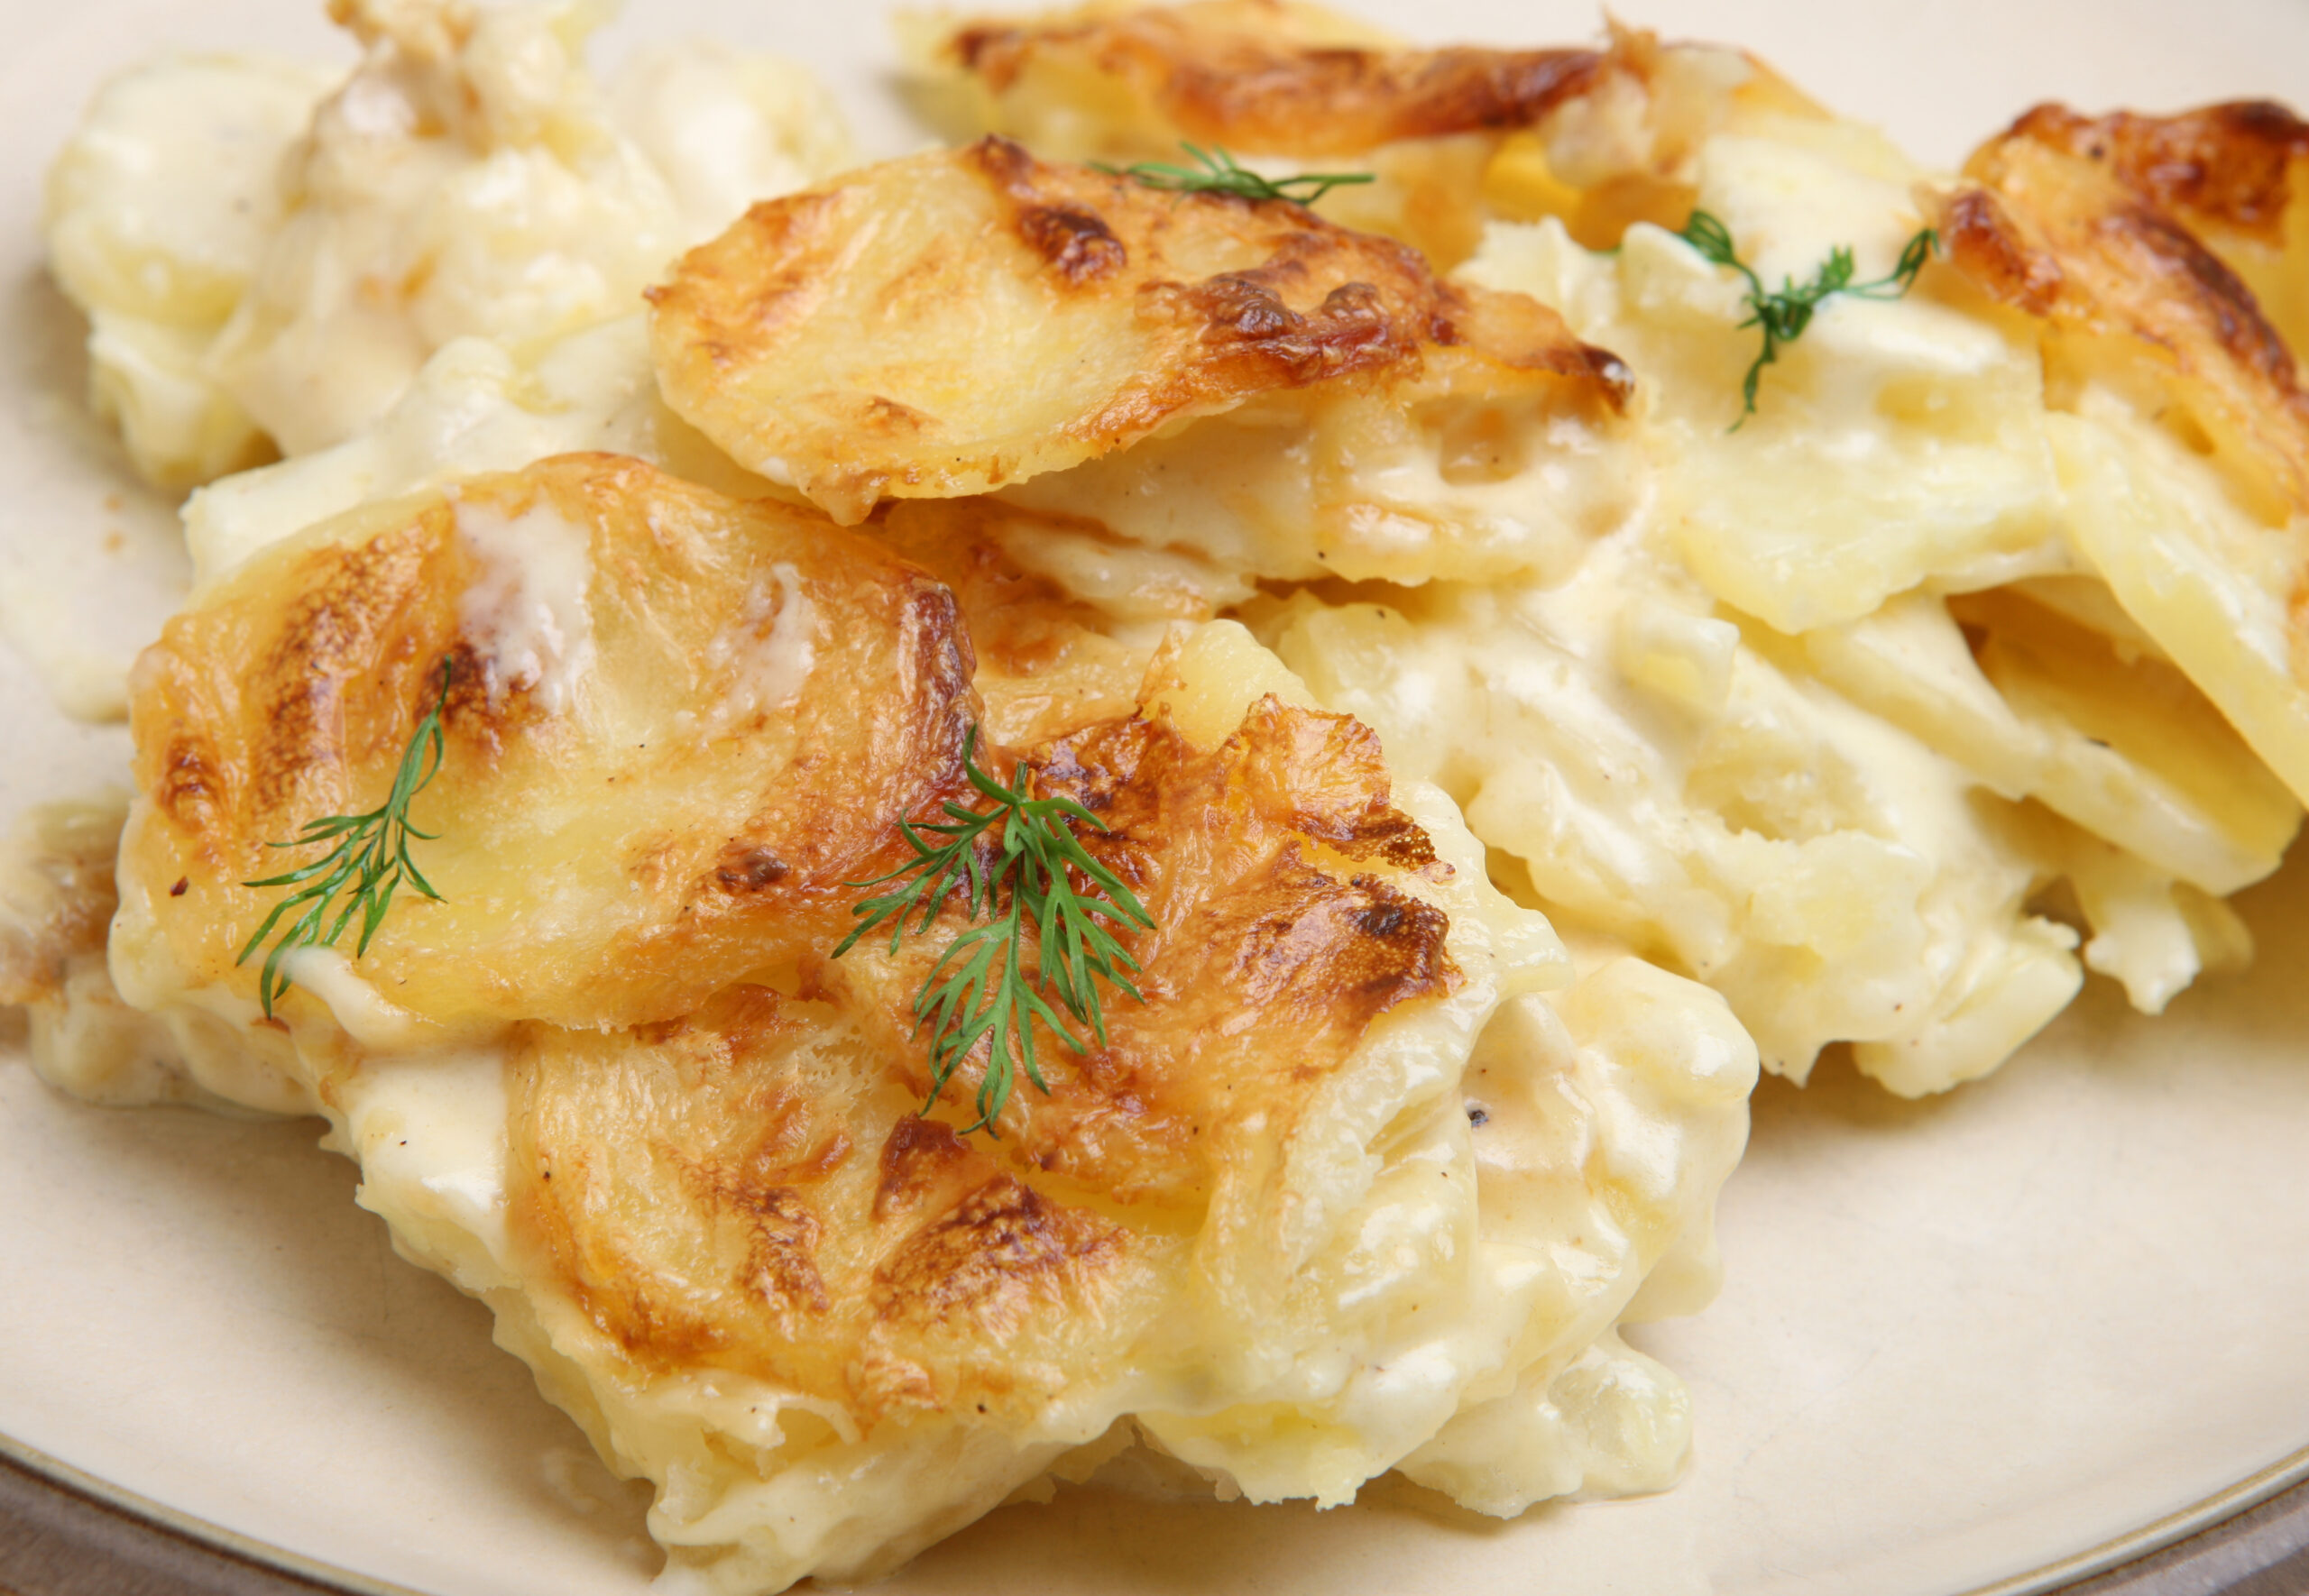 Cartofi cu smatana la cuptor